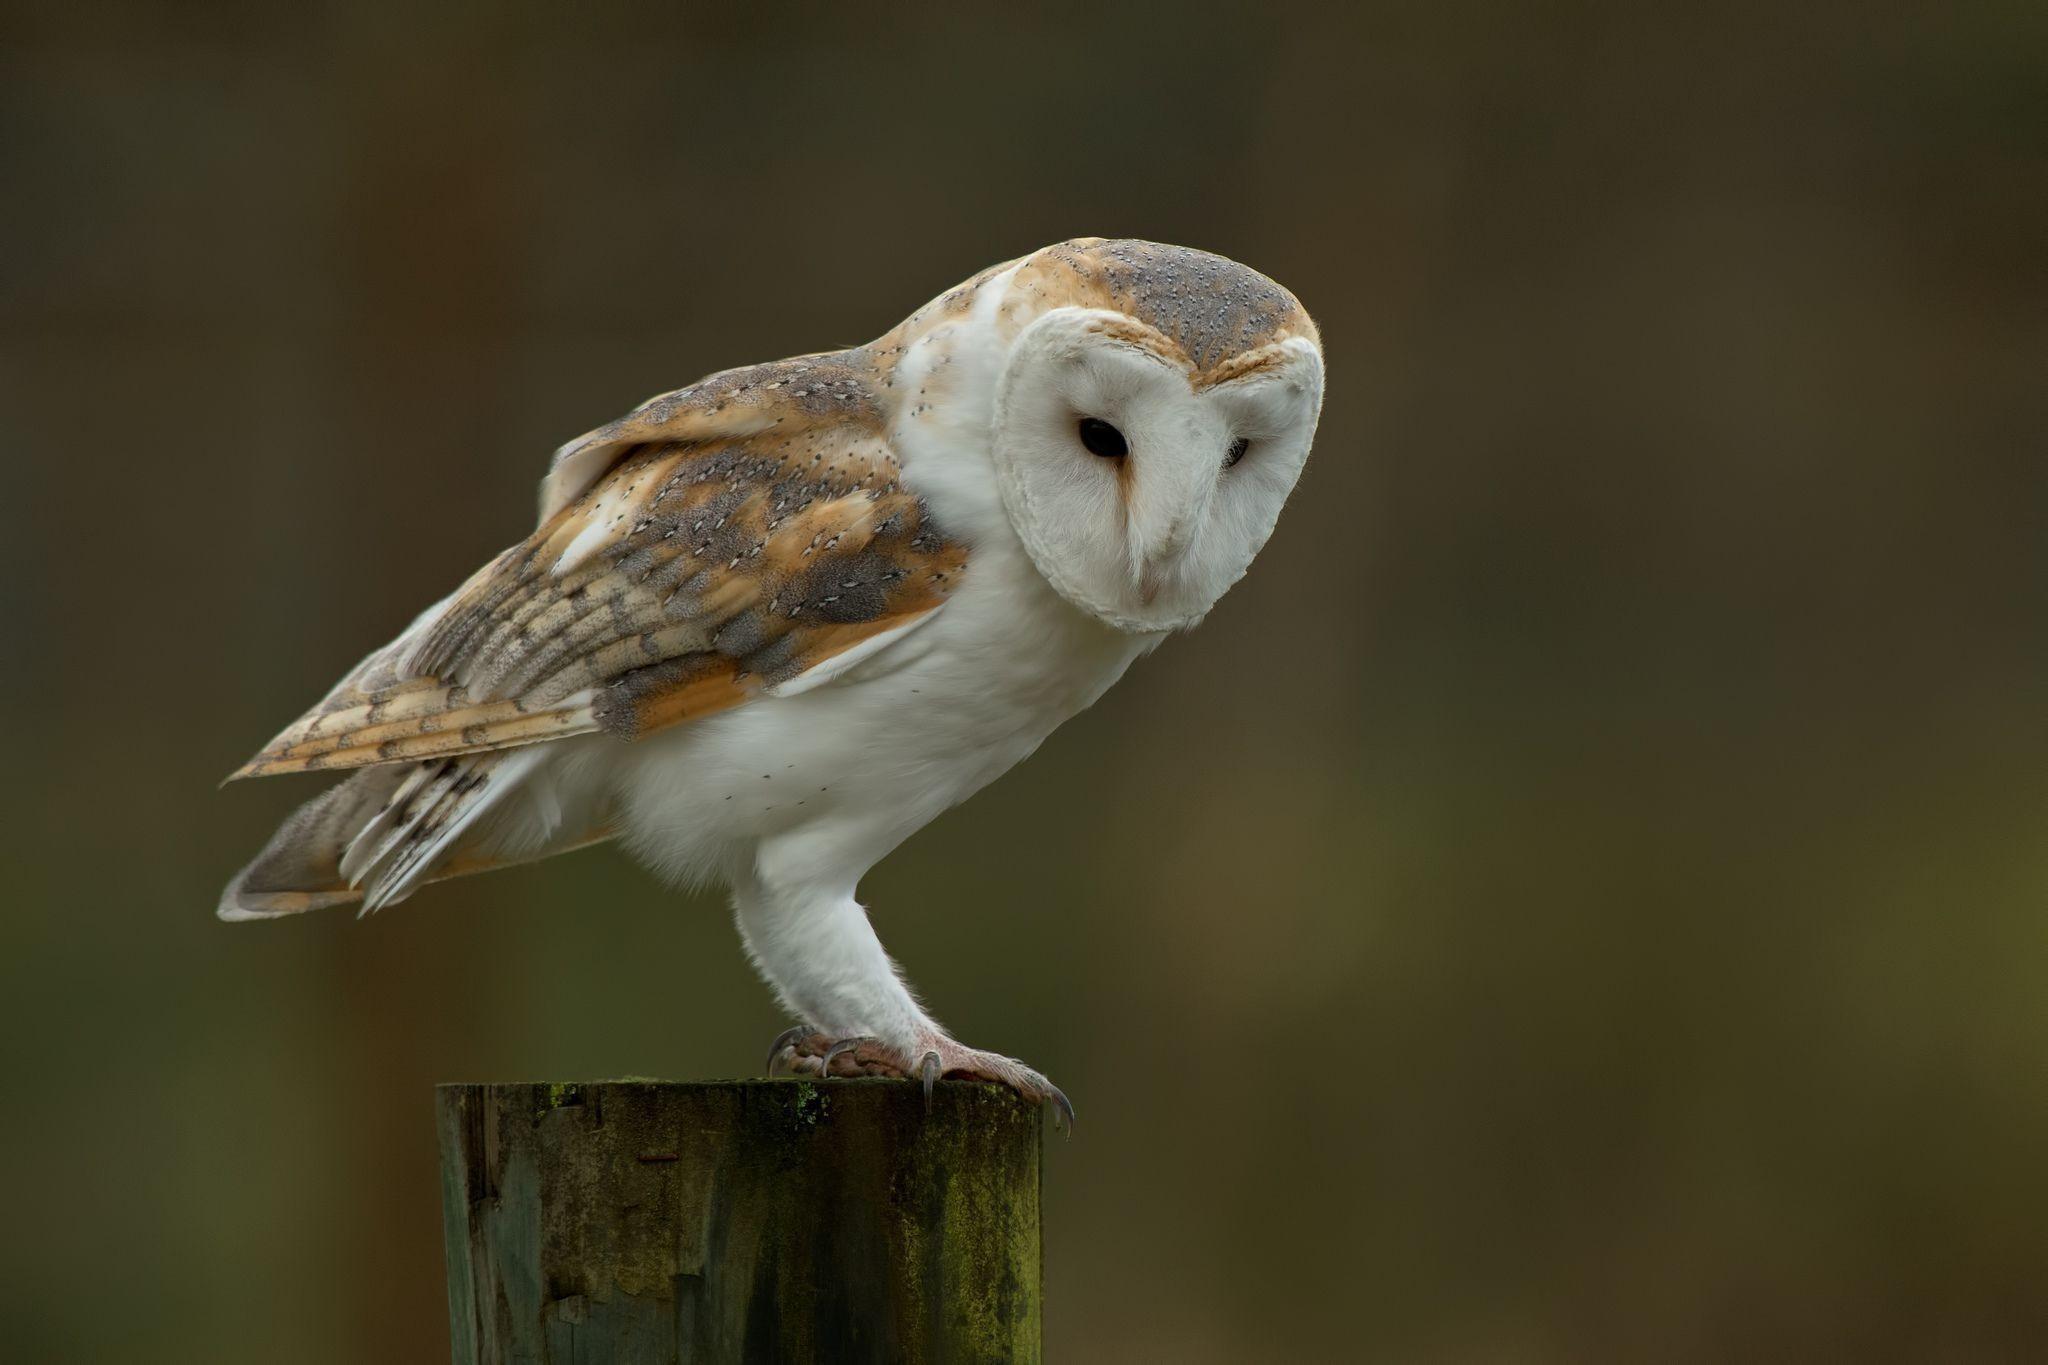 … Barn Owl Desktop Wallpaper …